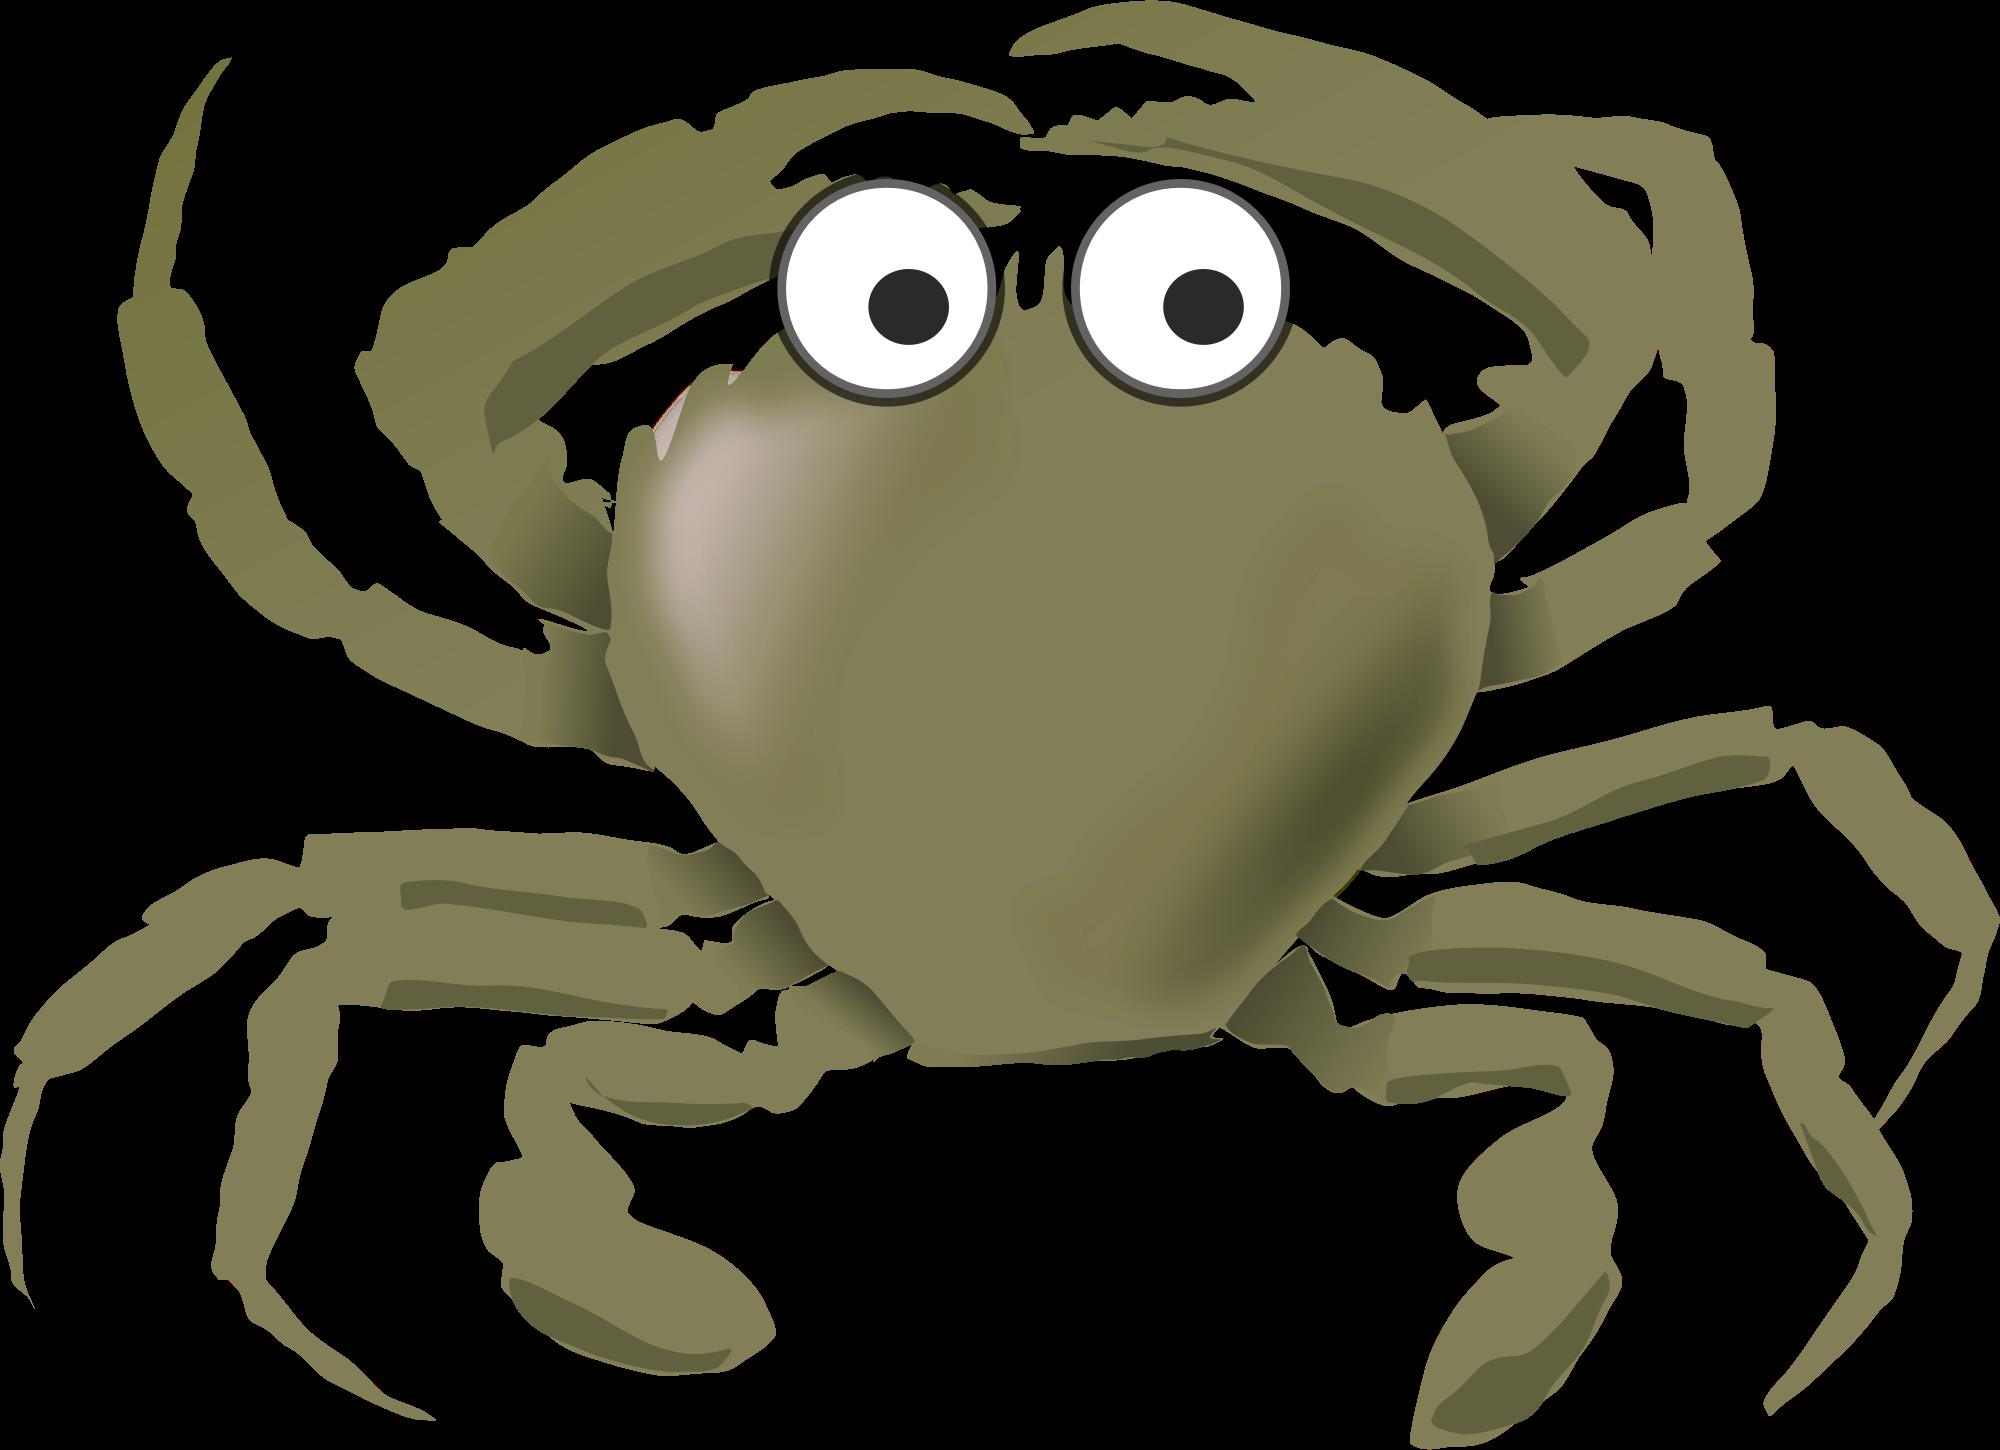 Crab clipart yellow crab. Cartoon green icons png